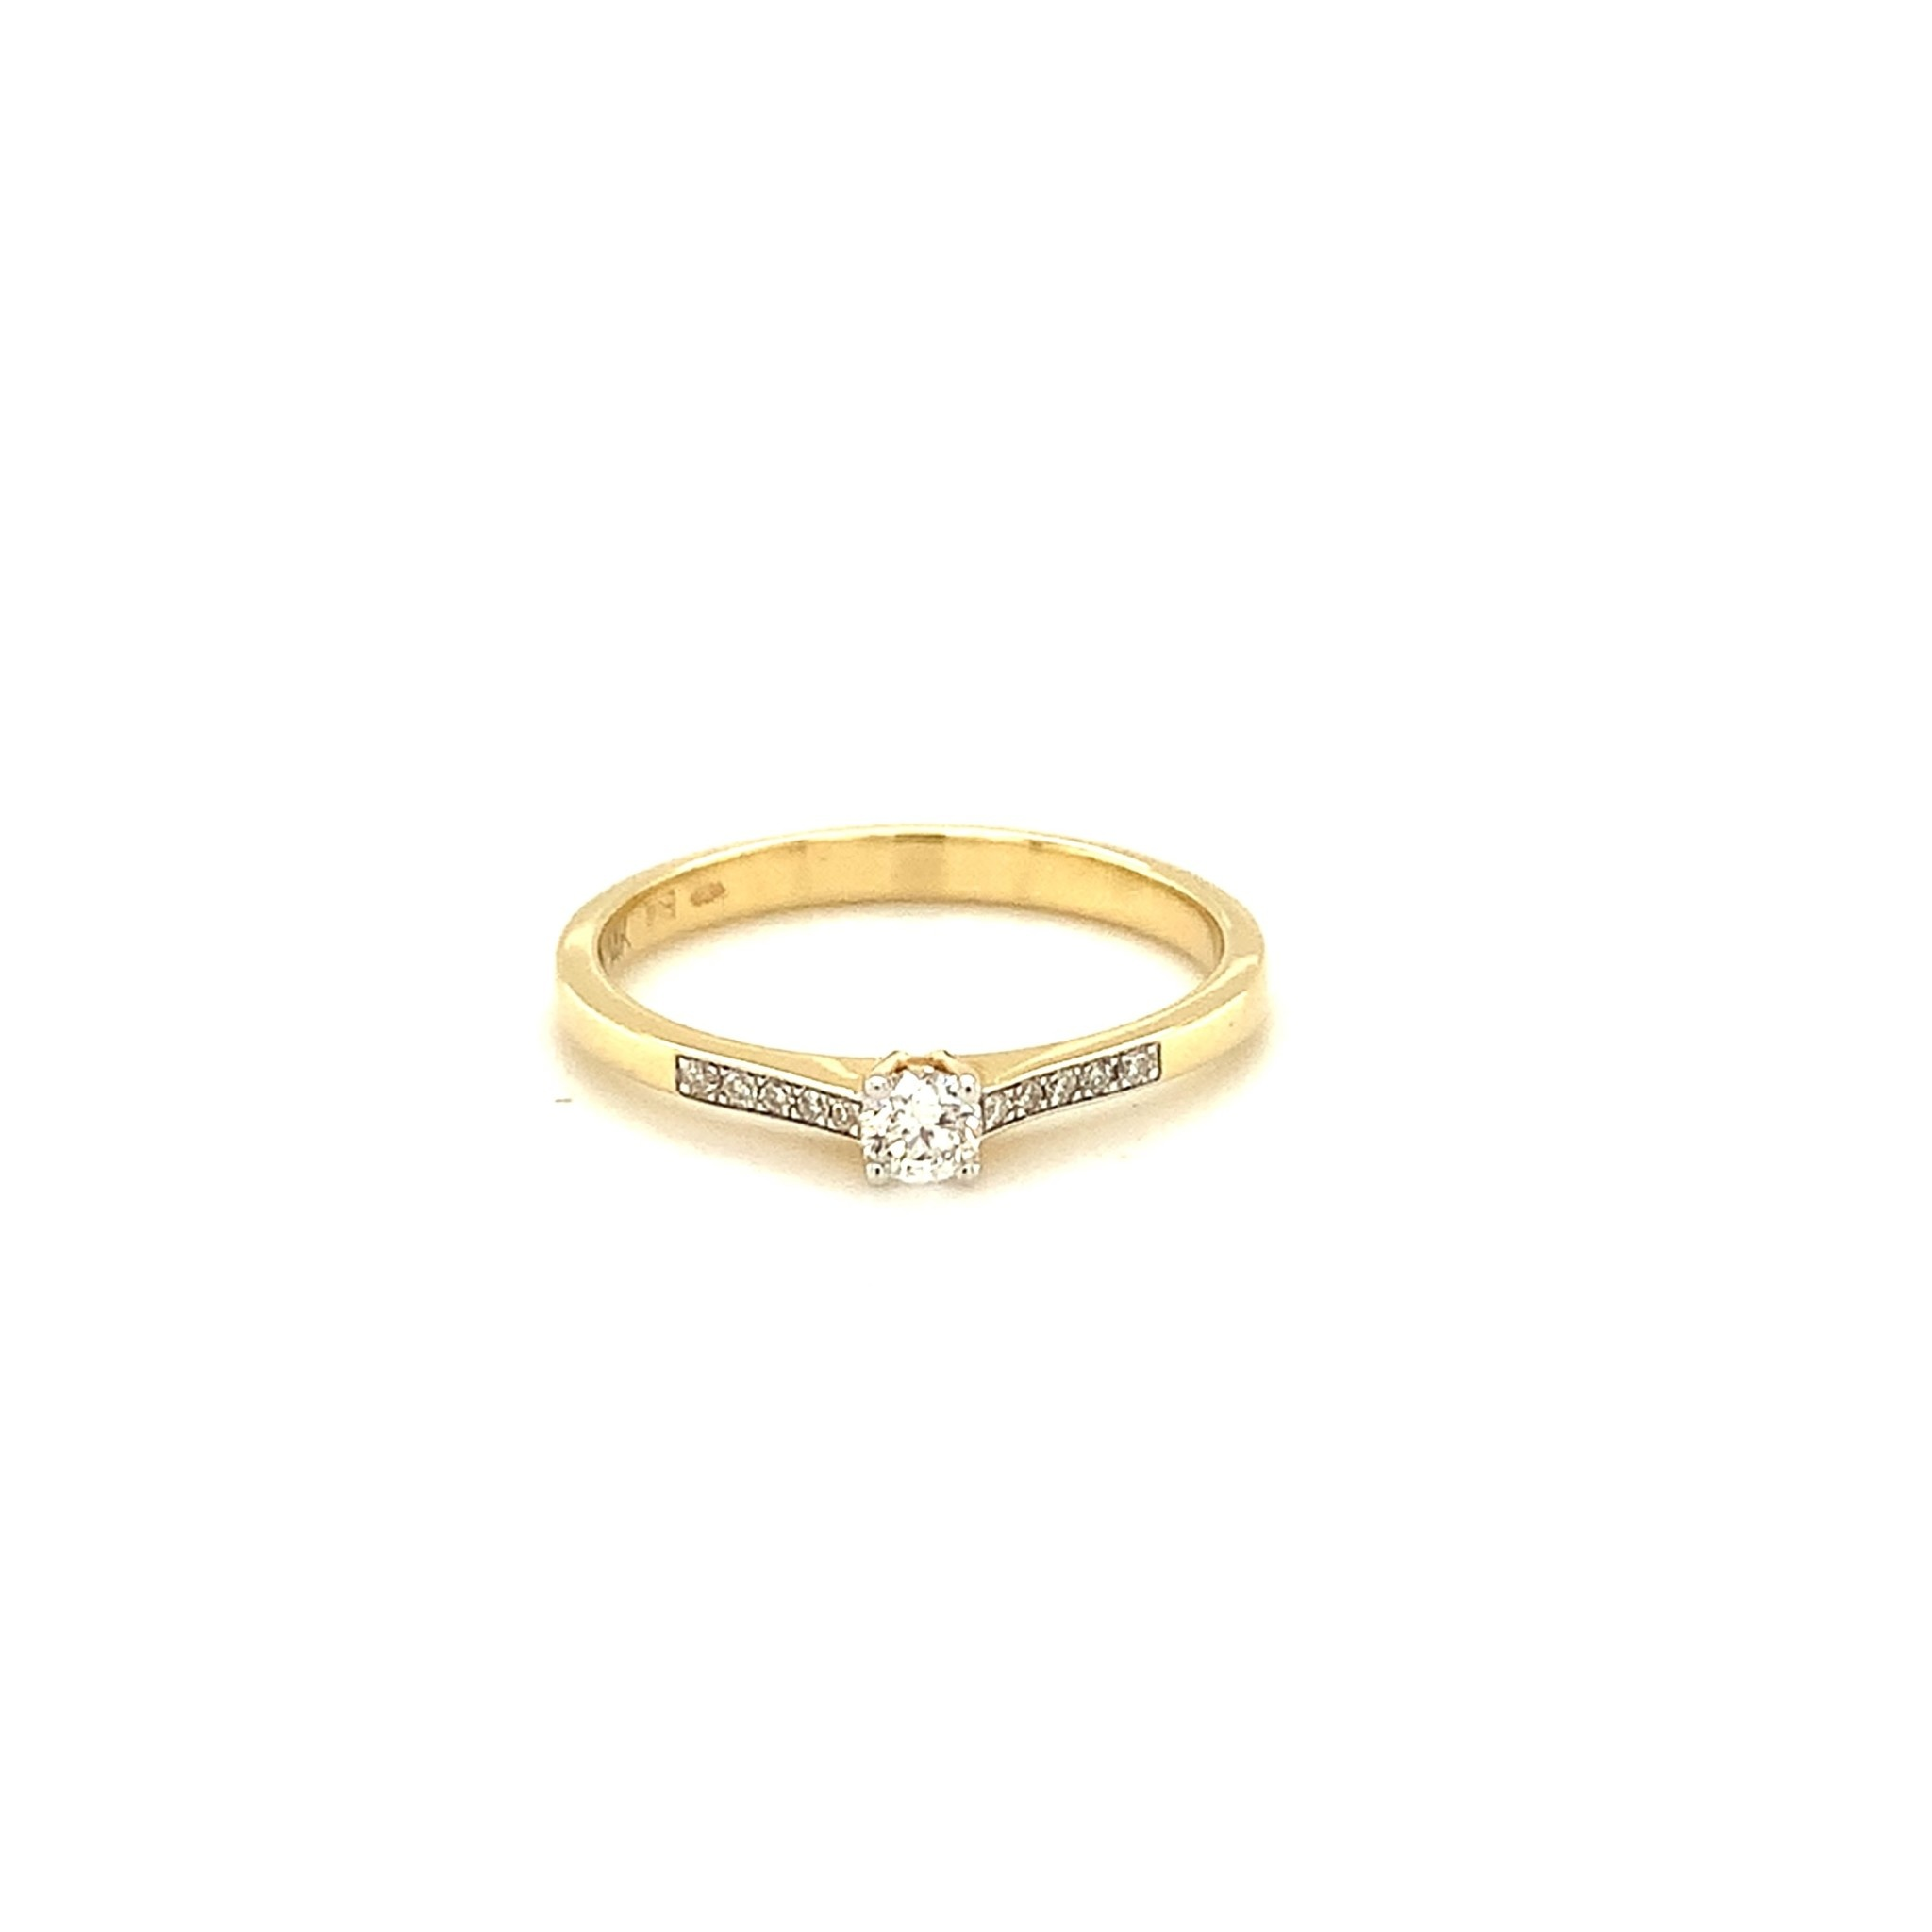 Passione Geelgouden ring met diamant 0.12ct H sI en 10x =0.05ct Hsi